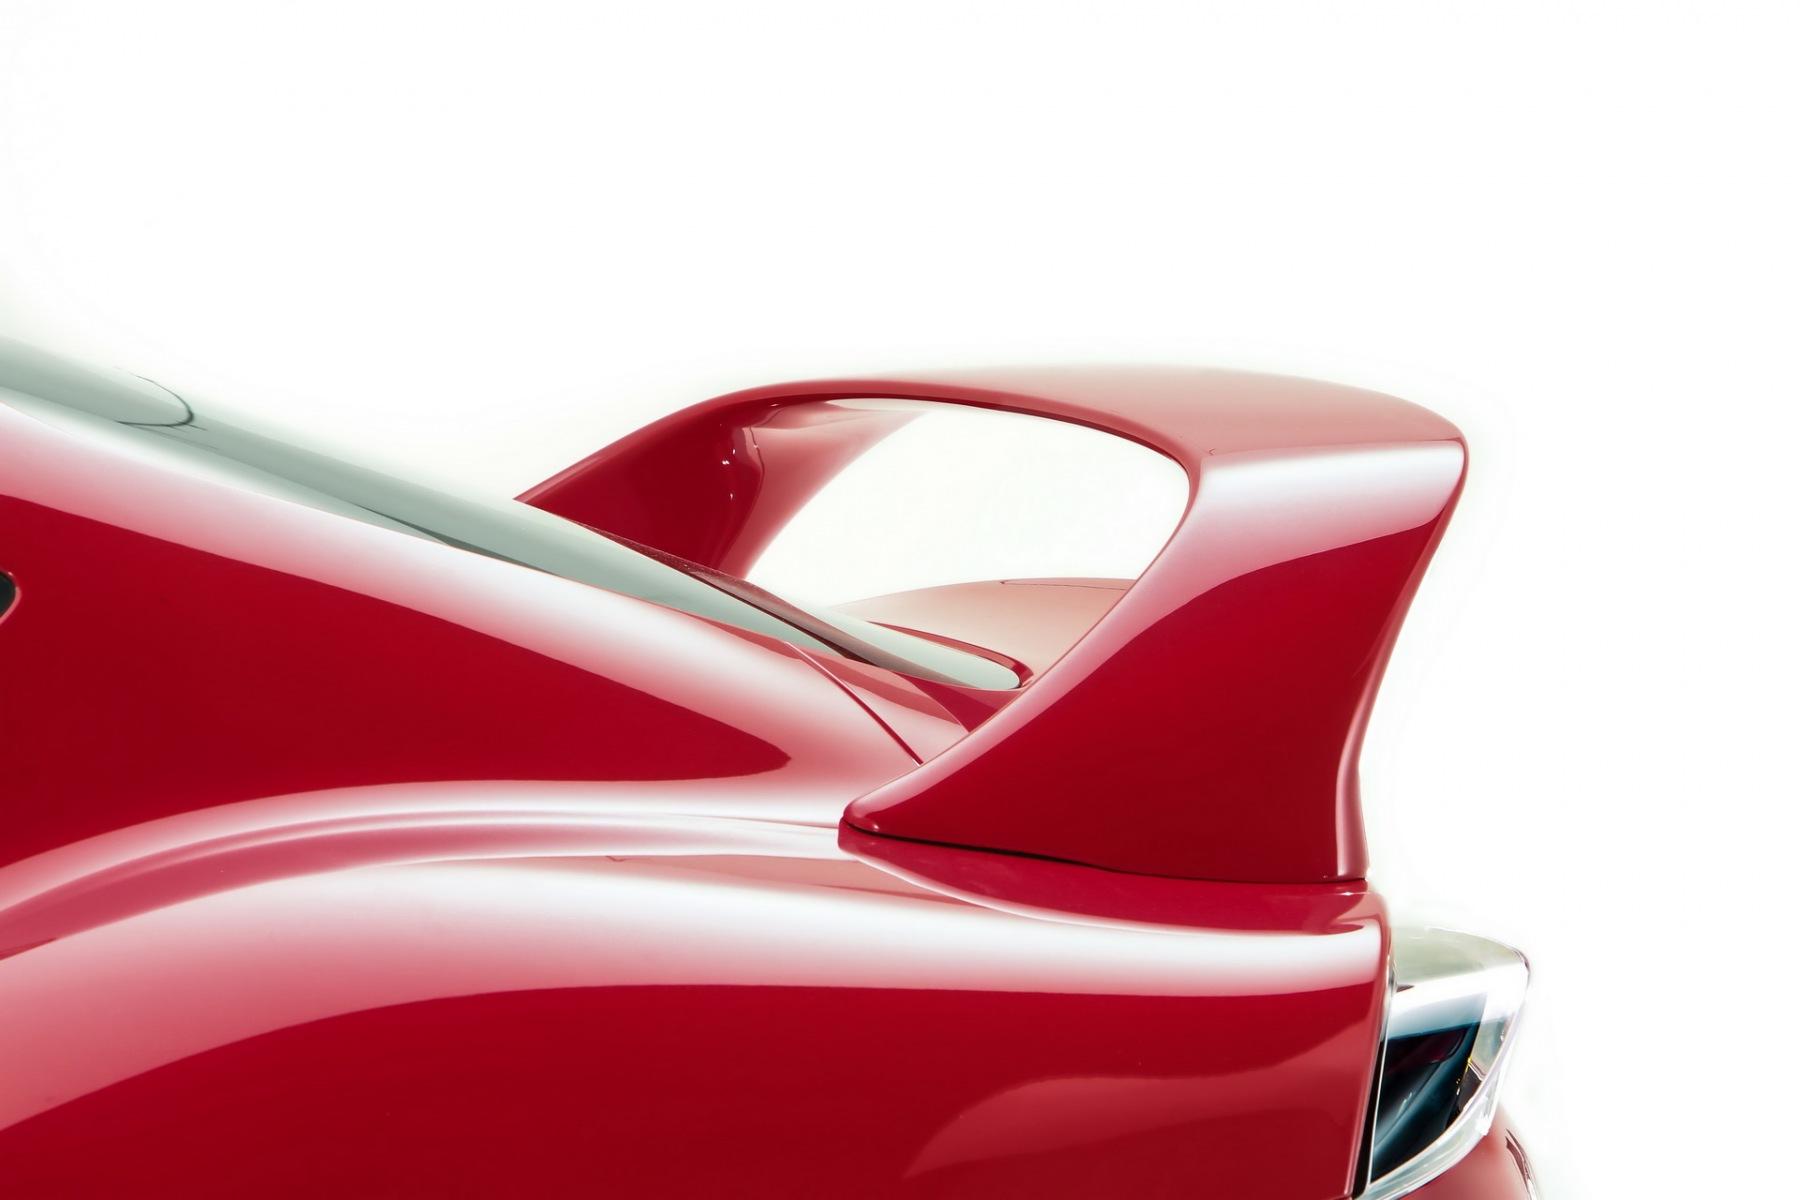 Toyota - SEMA Show 2020